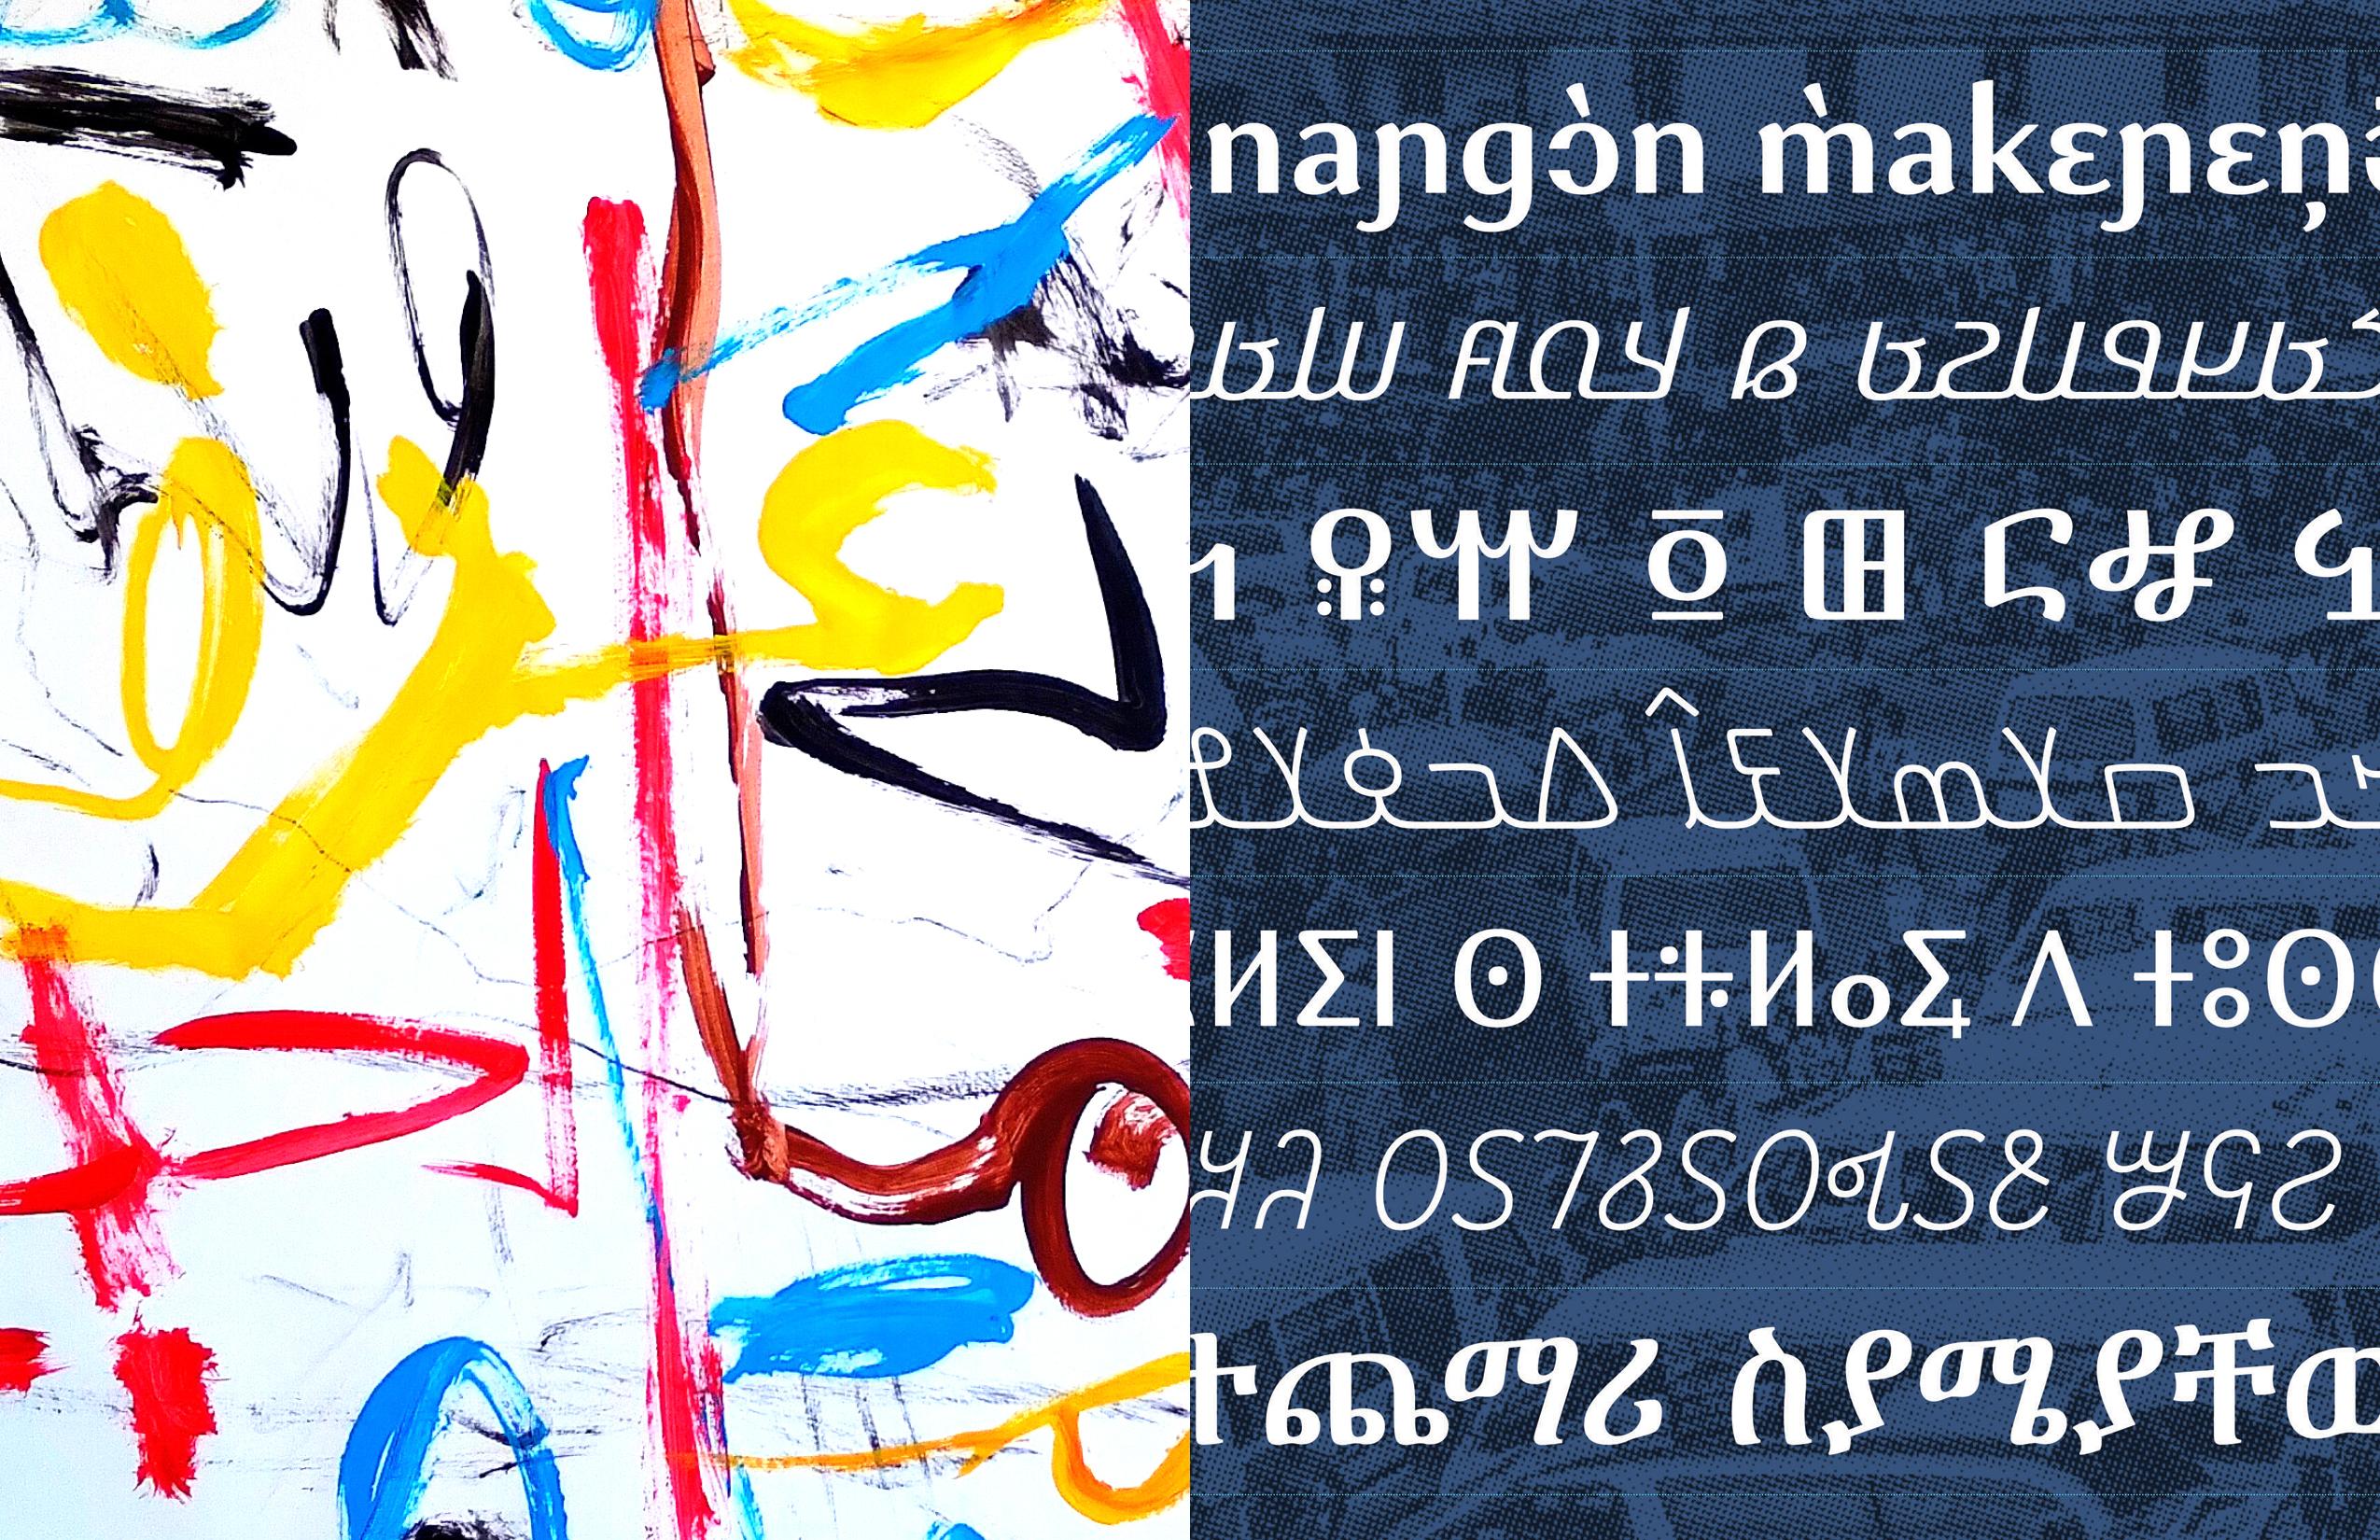 Alphabet City: Art, Culture, and Letterforms